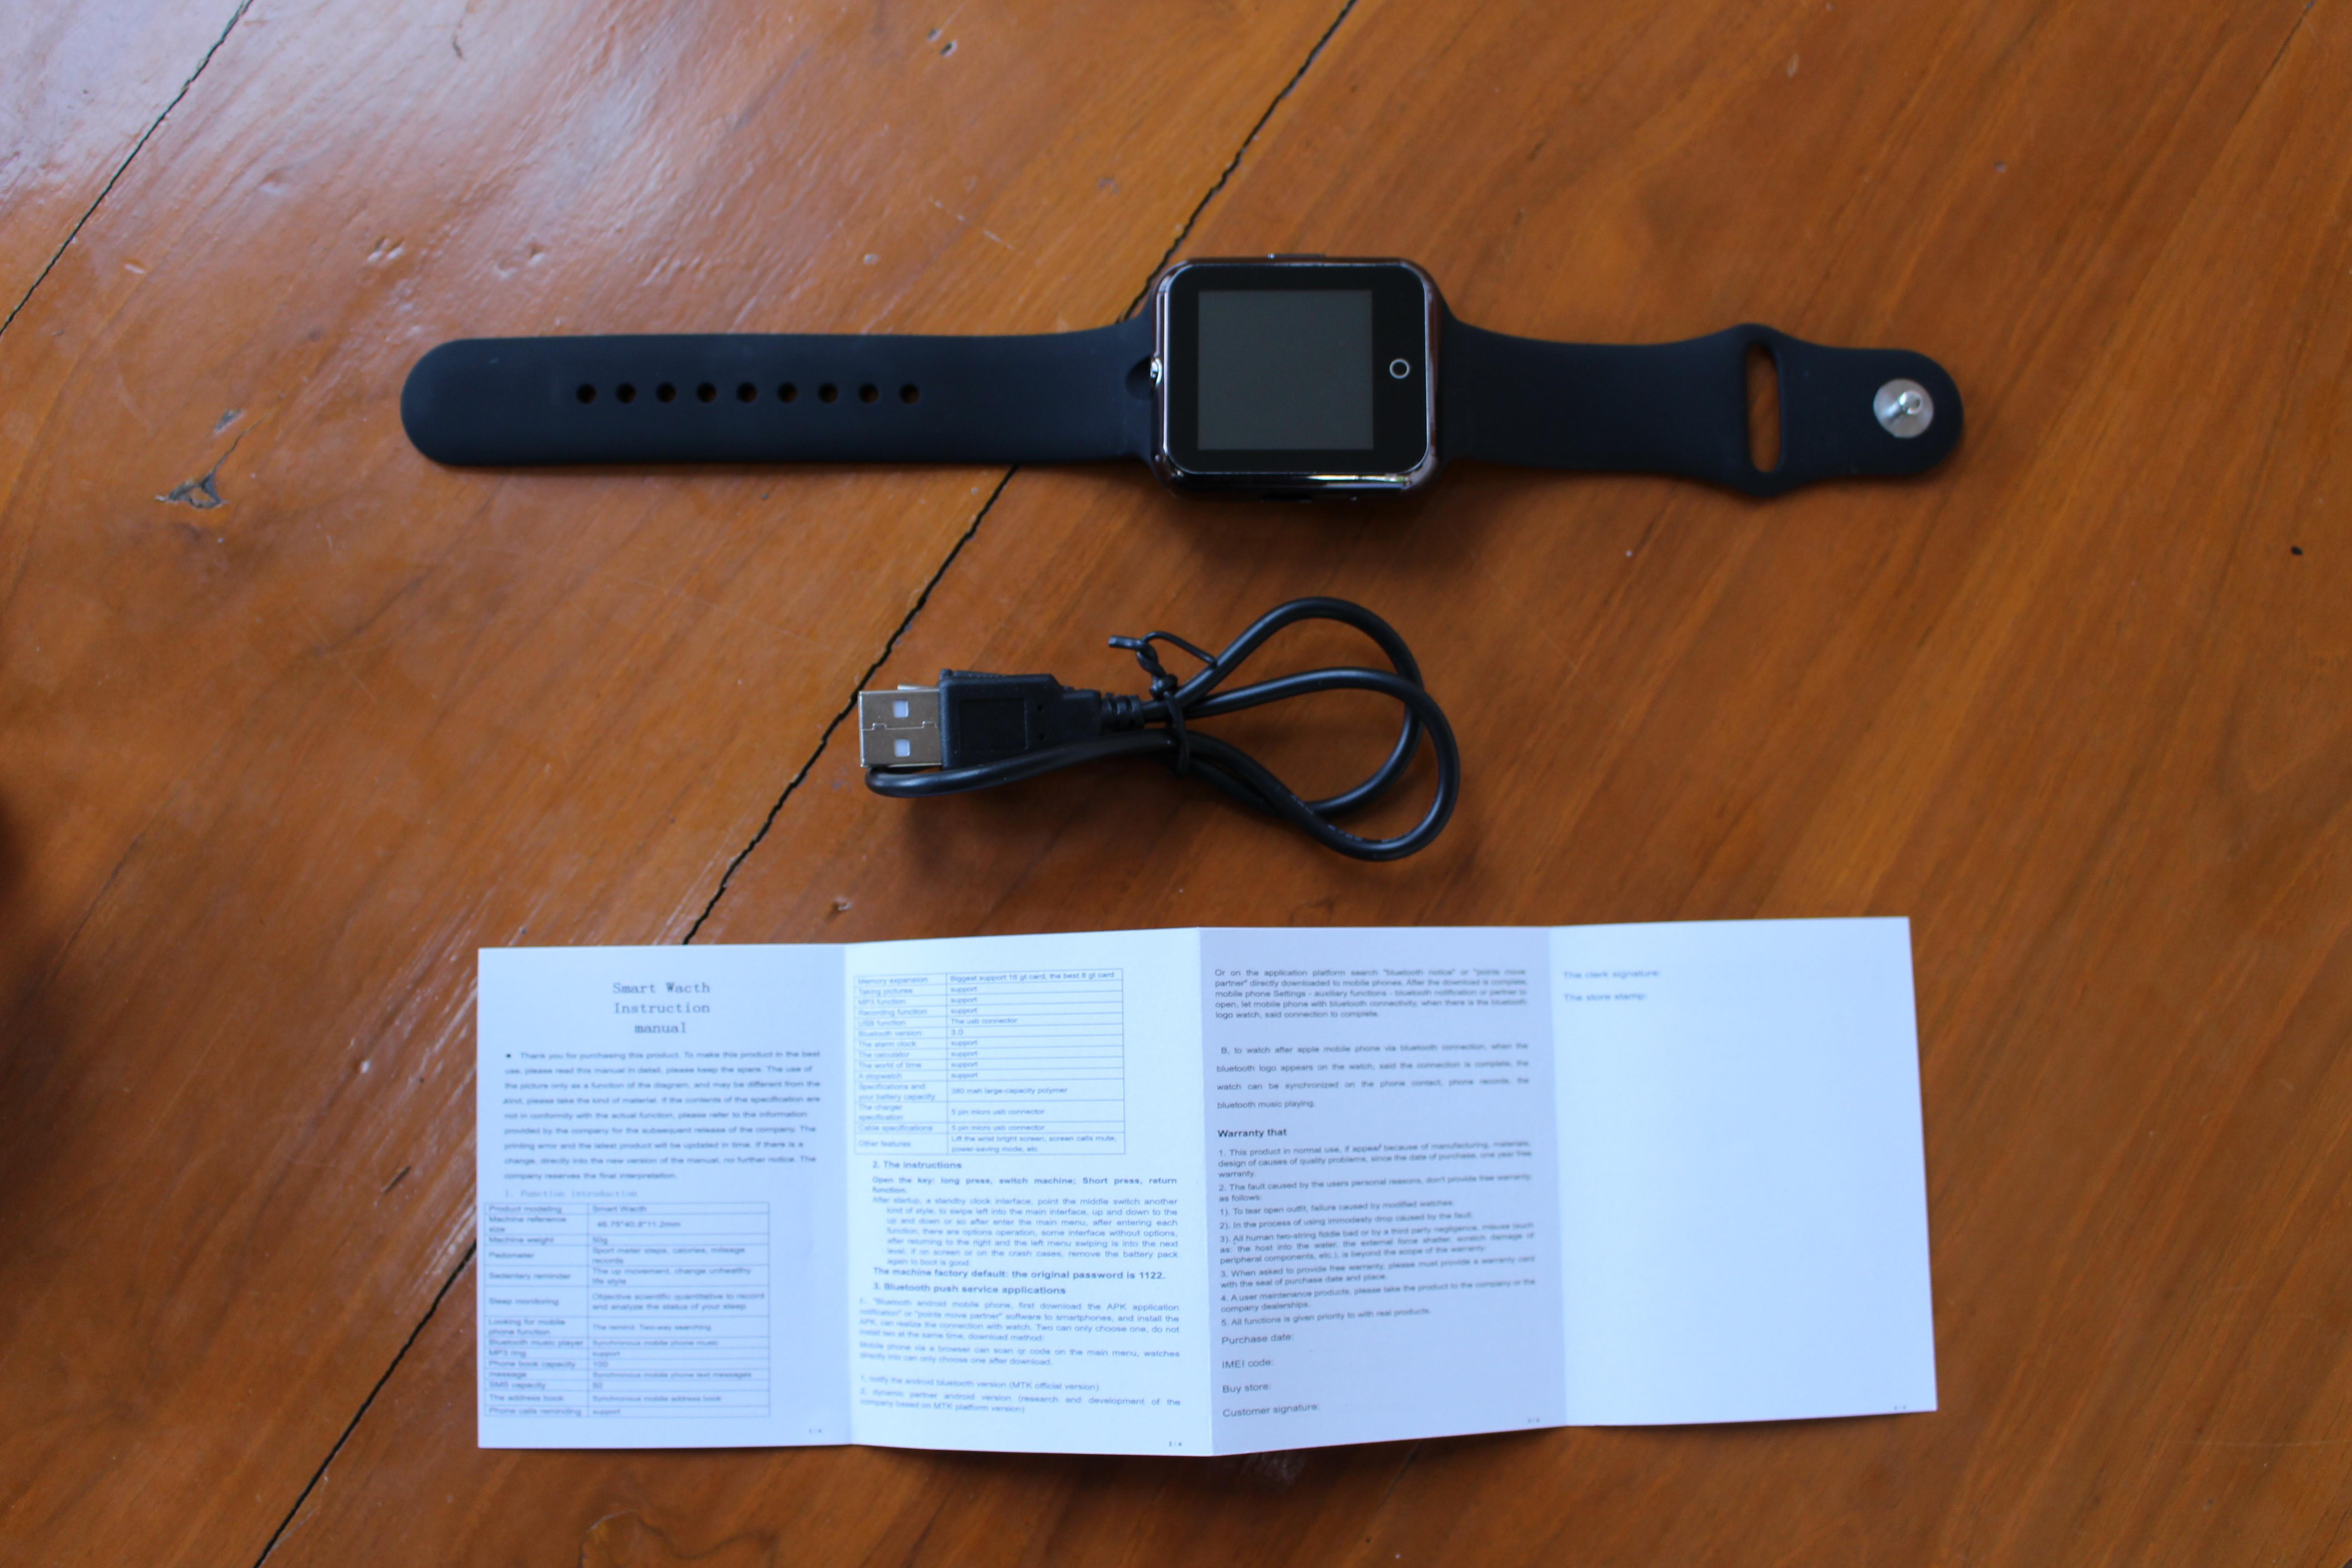 no 1 d3 smartwatch specs unboxing and teardown rh cnx software com centurion d3 user manual centurion d3 user manual